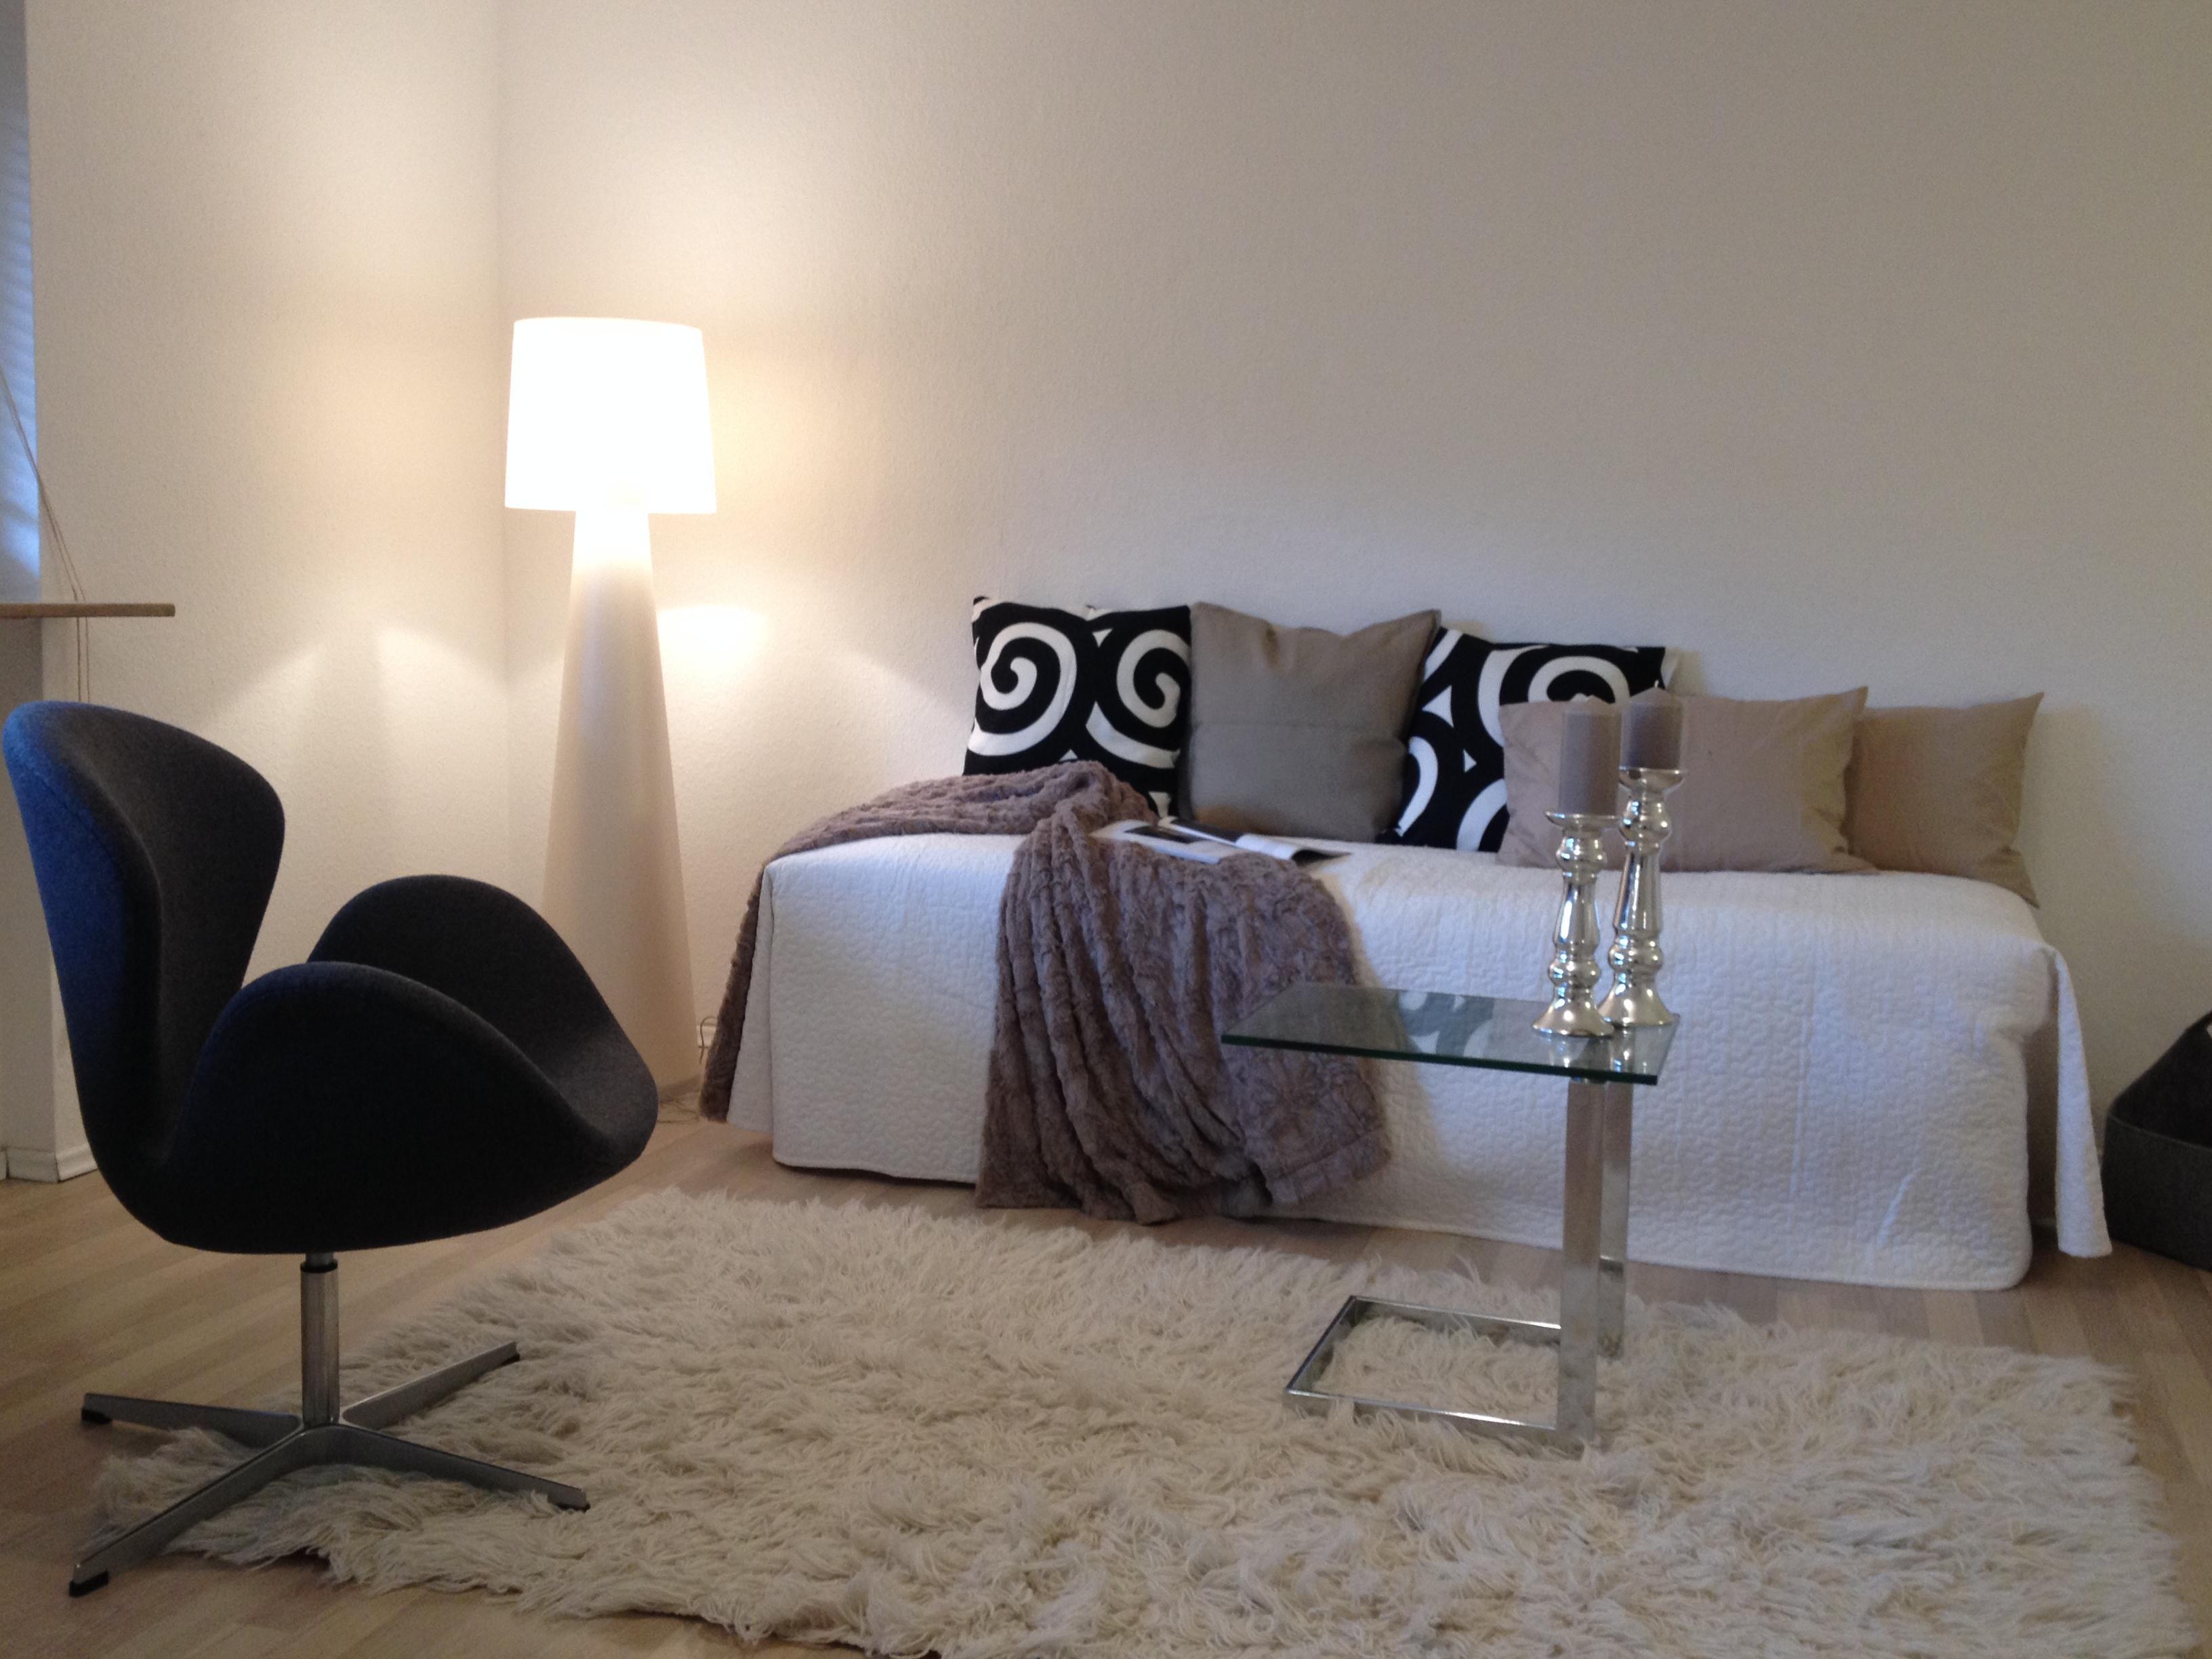 Wandfarbe Beige Style : Beige wandfarbe bilder ideen couchstyle